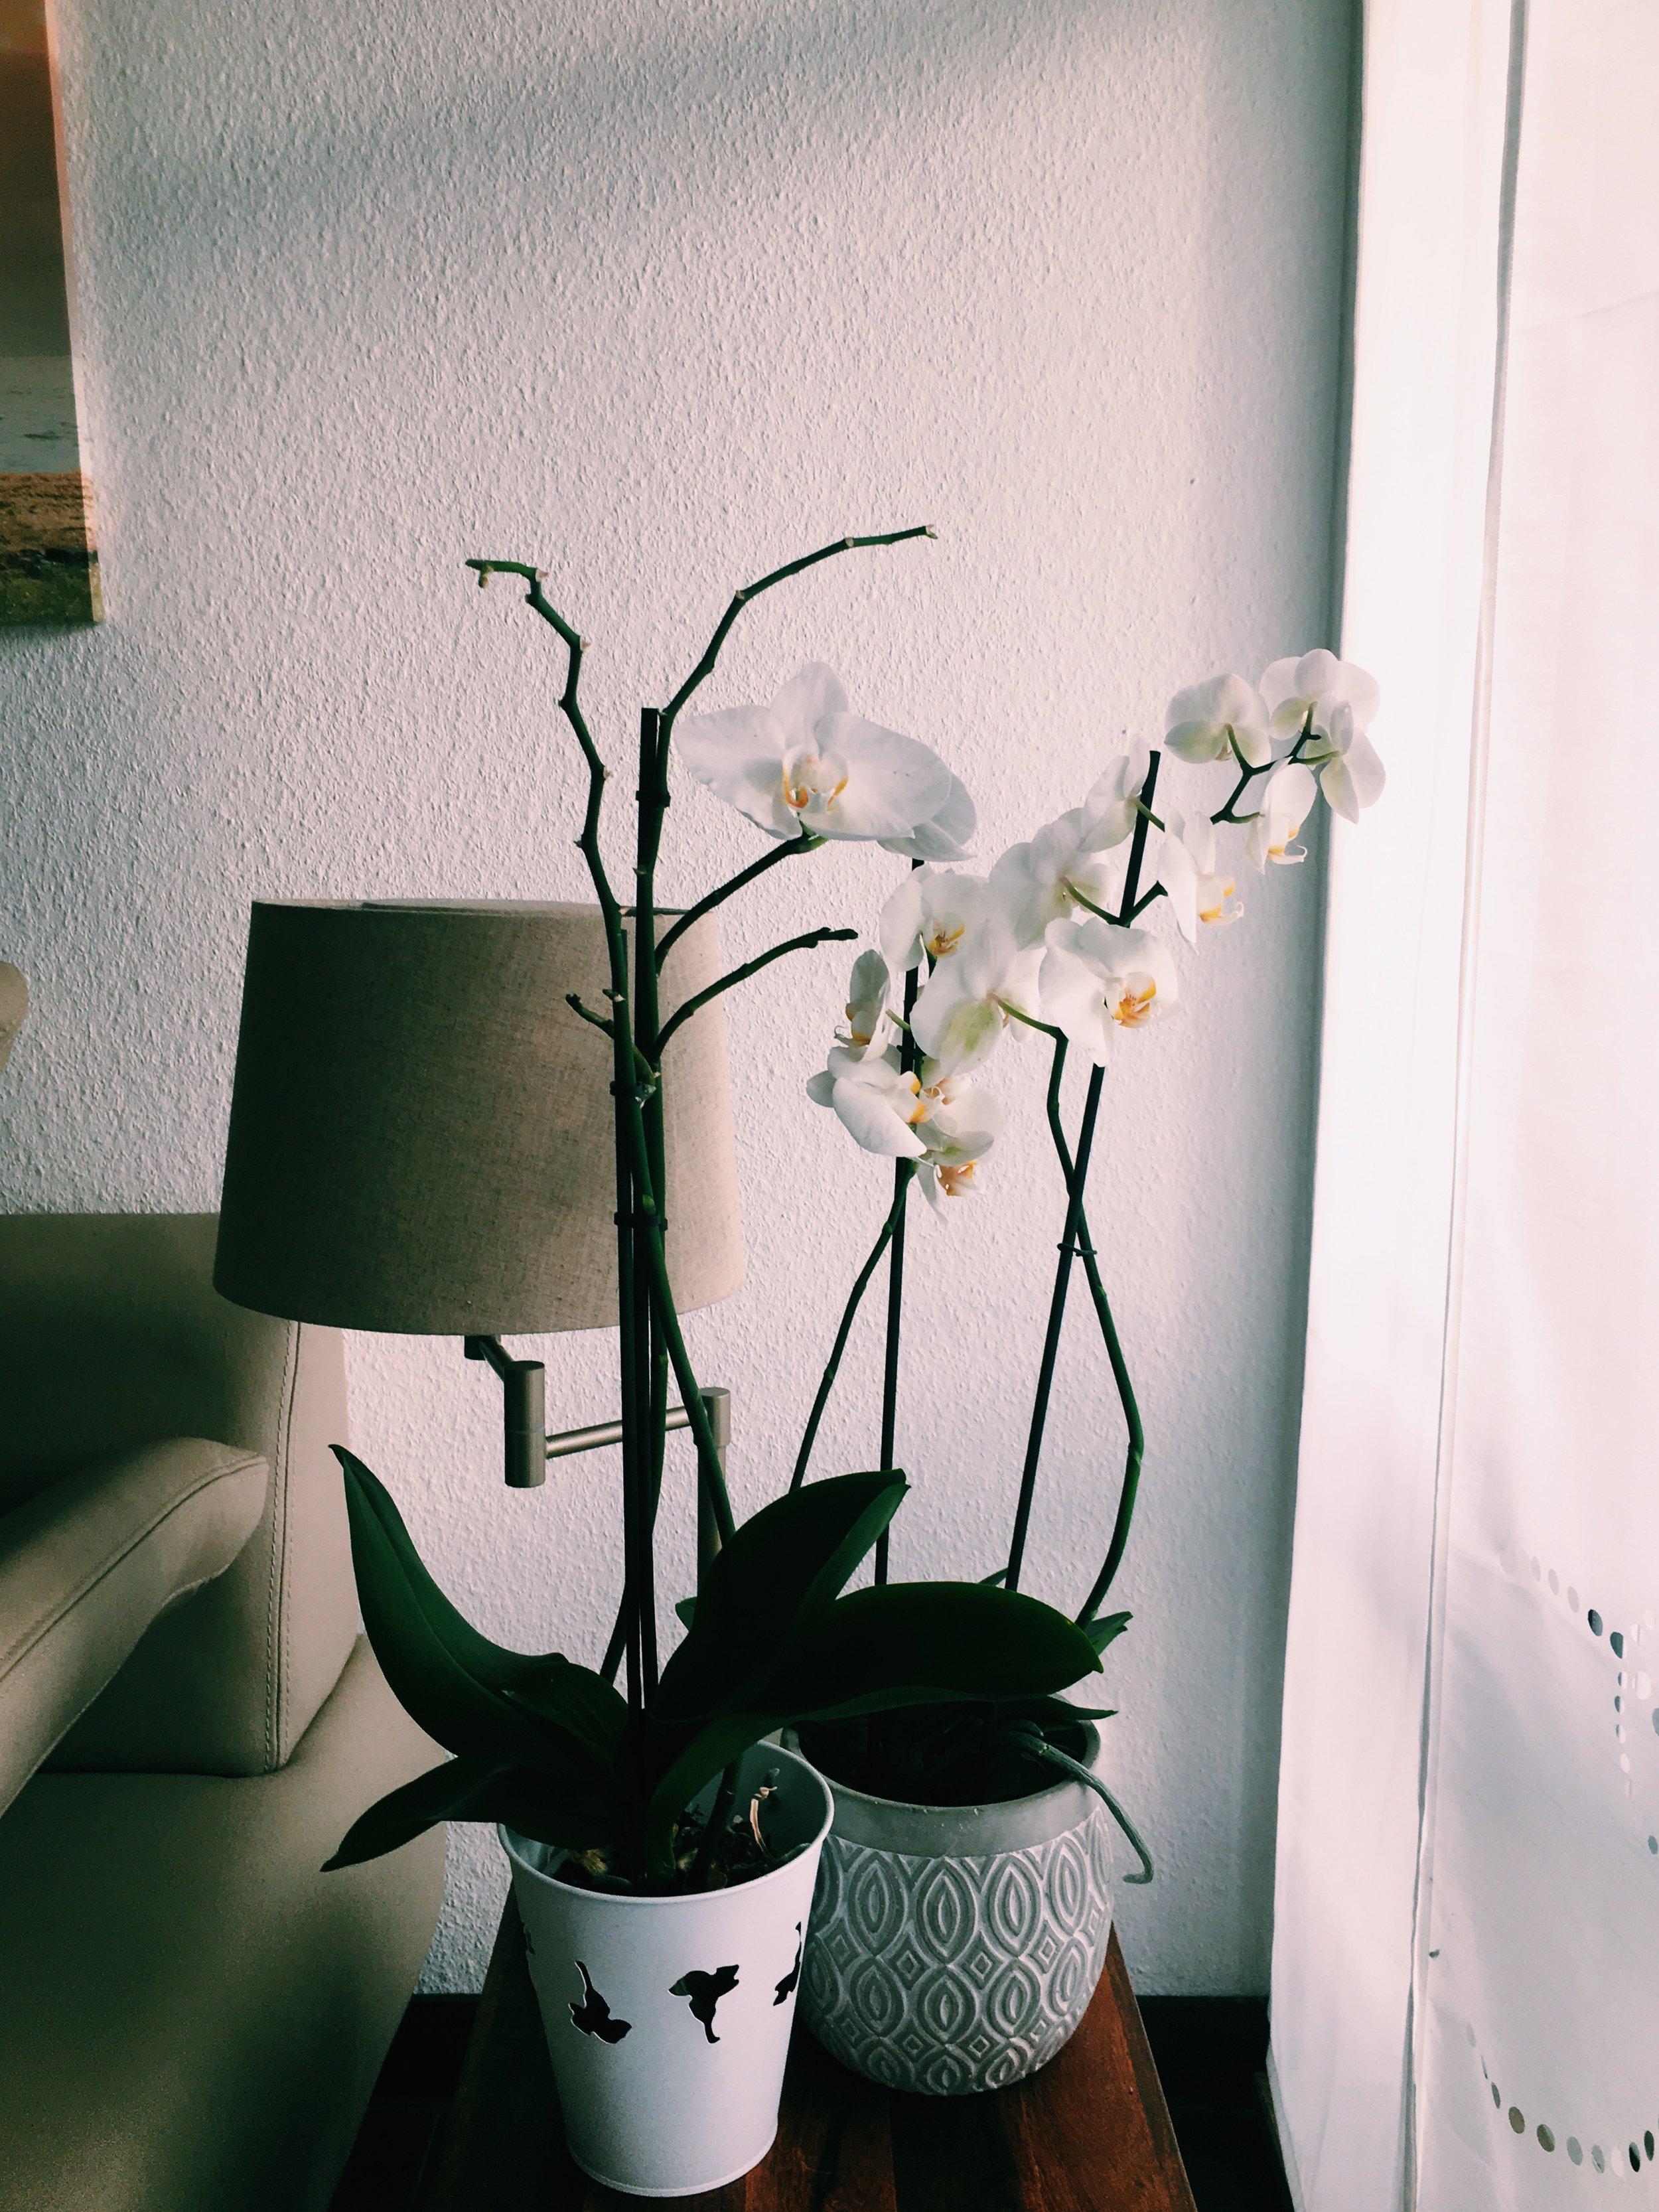 2.Orchid - コチョウラン